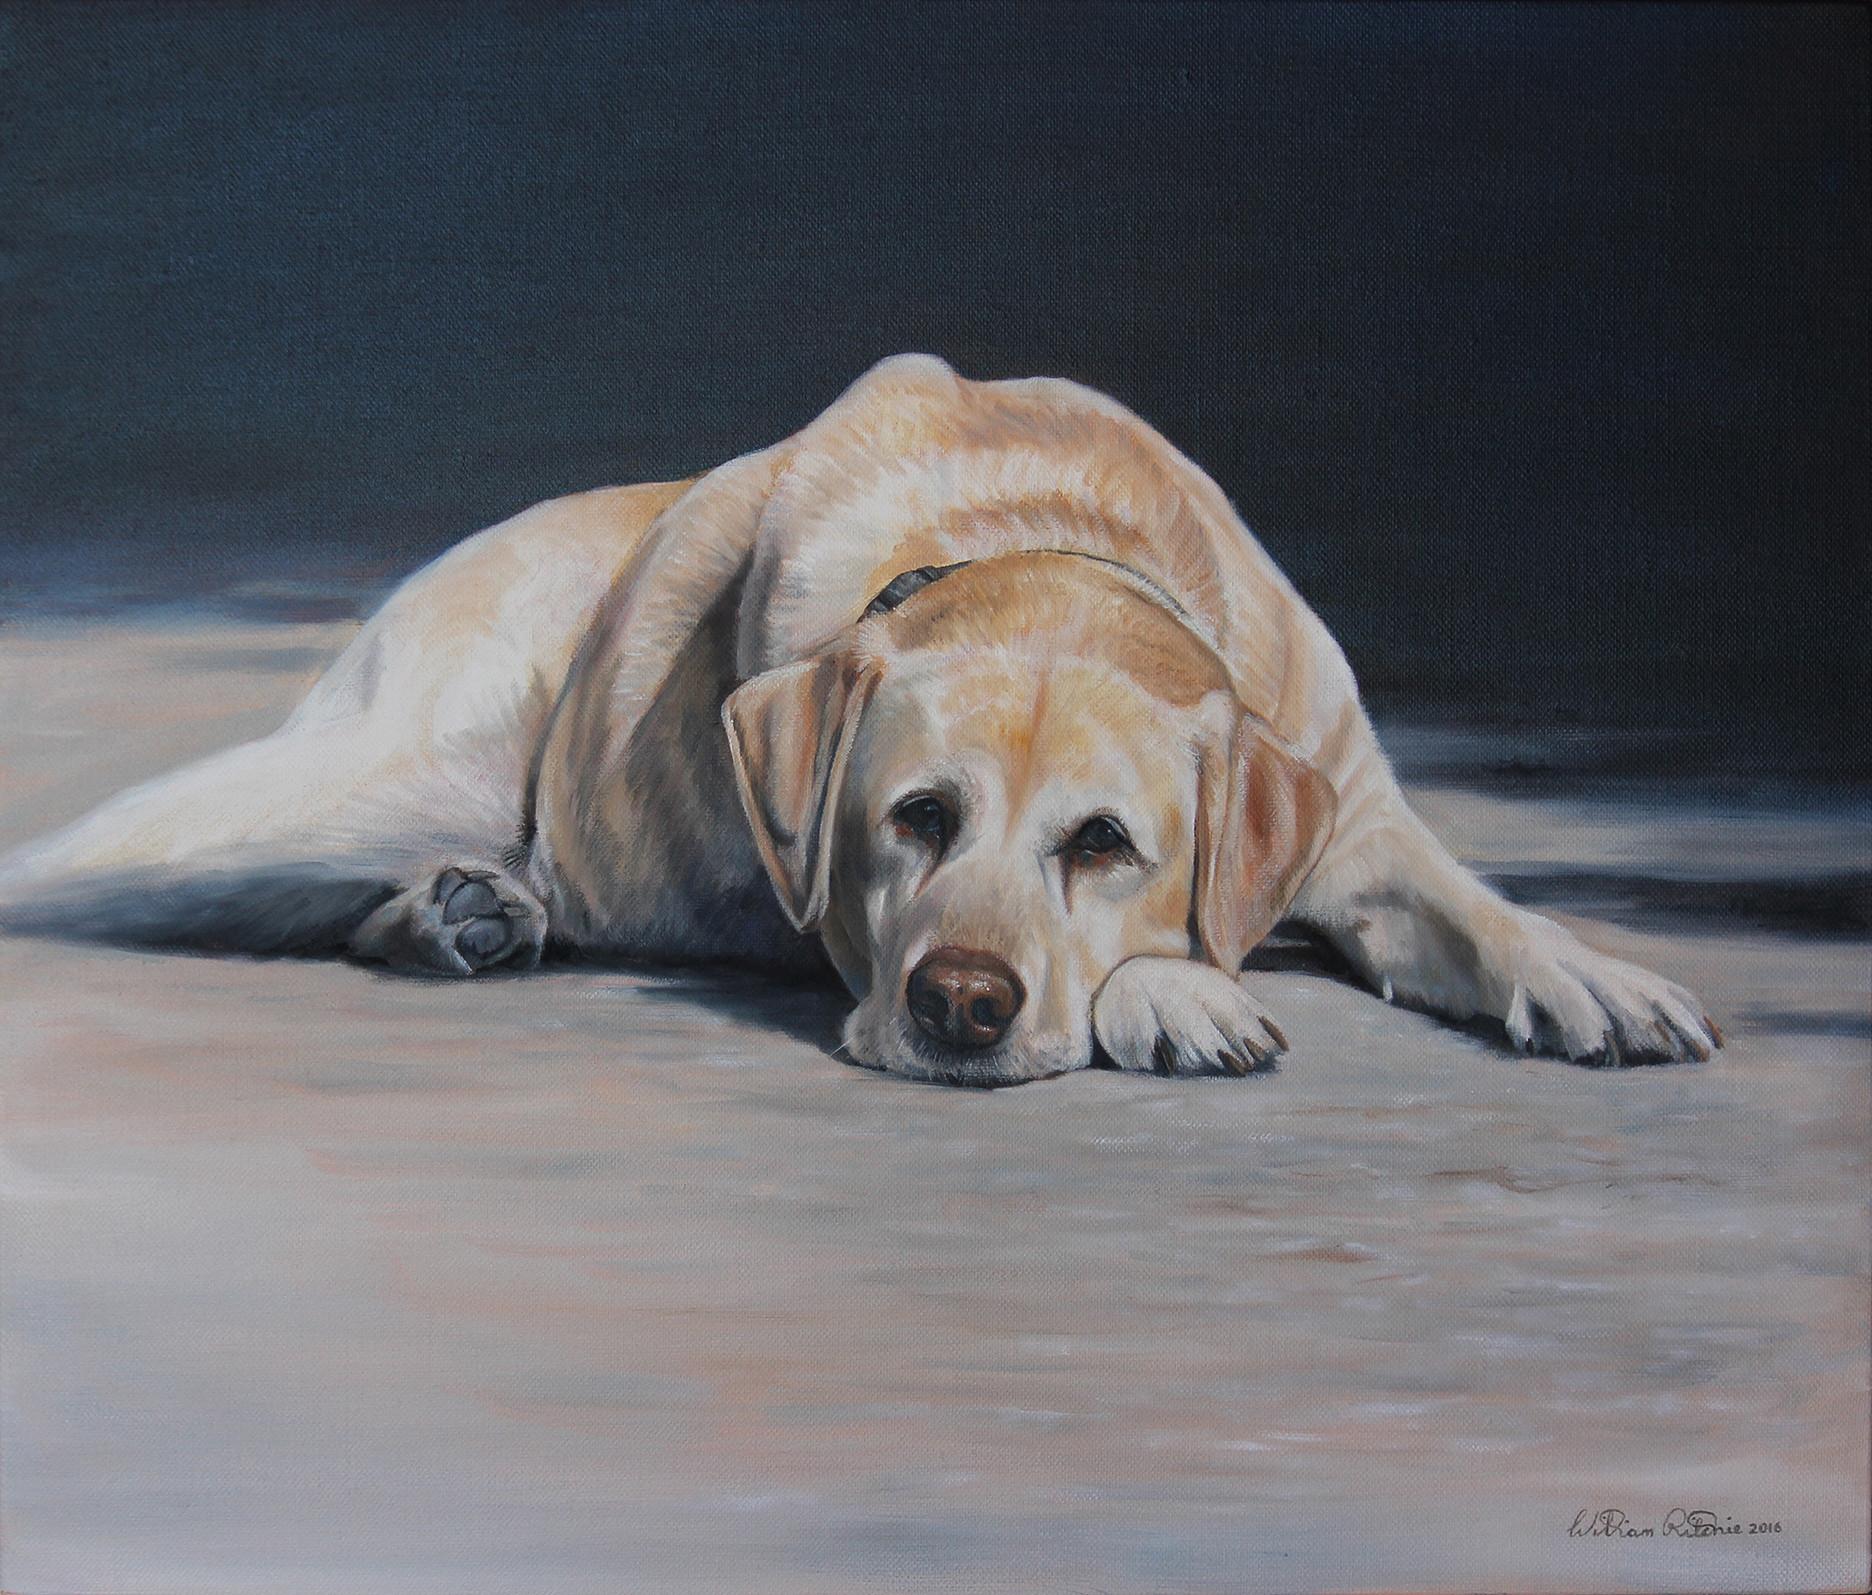 Sally the Australian Army Explosive Detection Dog